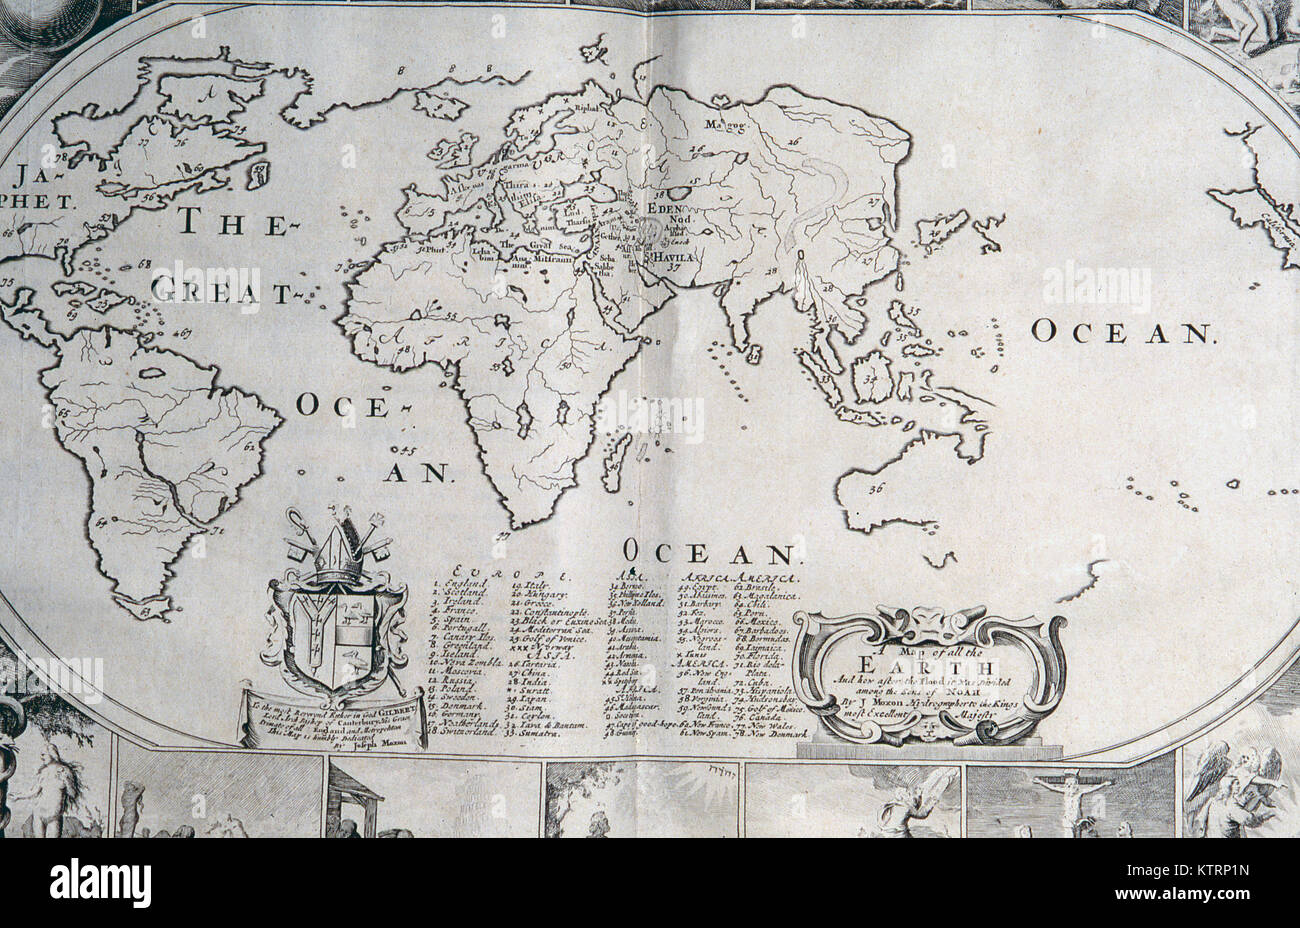 New zealand map stock photos new zealand map stock images alamy 1770 world map without new zealand or the east coast of australia courtesy of the gumiabroncs Choice Image